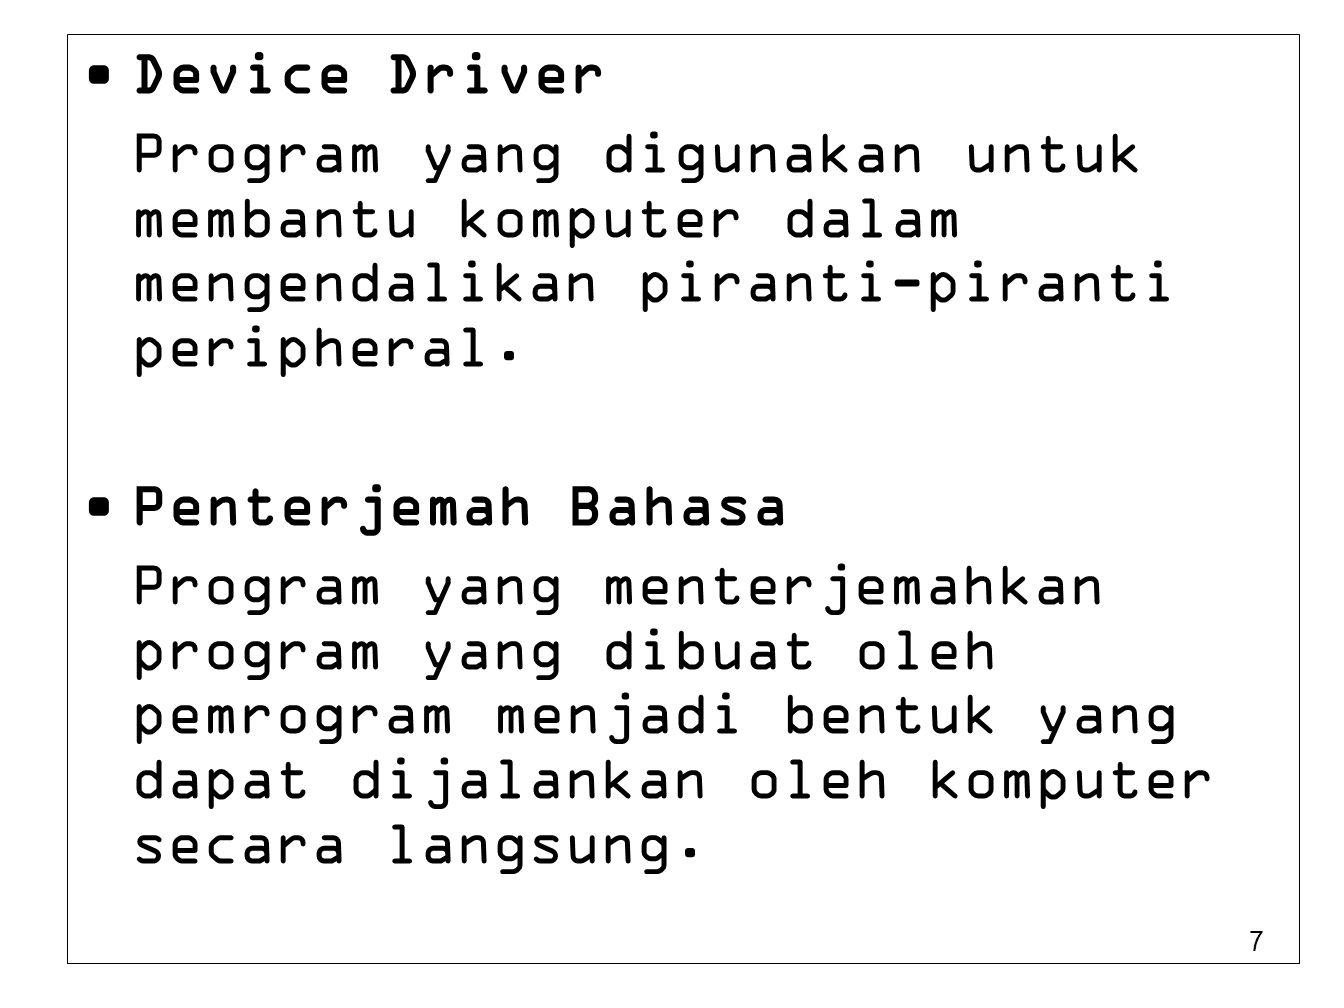 Device Driver Program yang digunakan untuk membantu komputer dalam mengendalikan piranti-piranti peripheral.